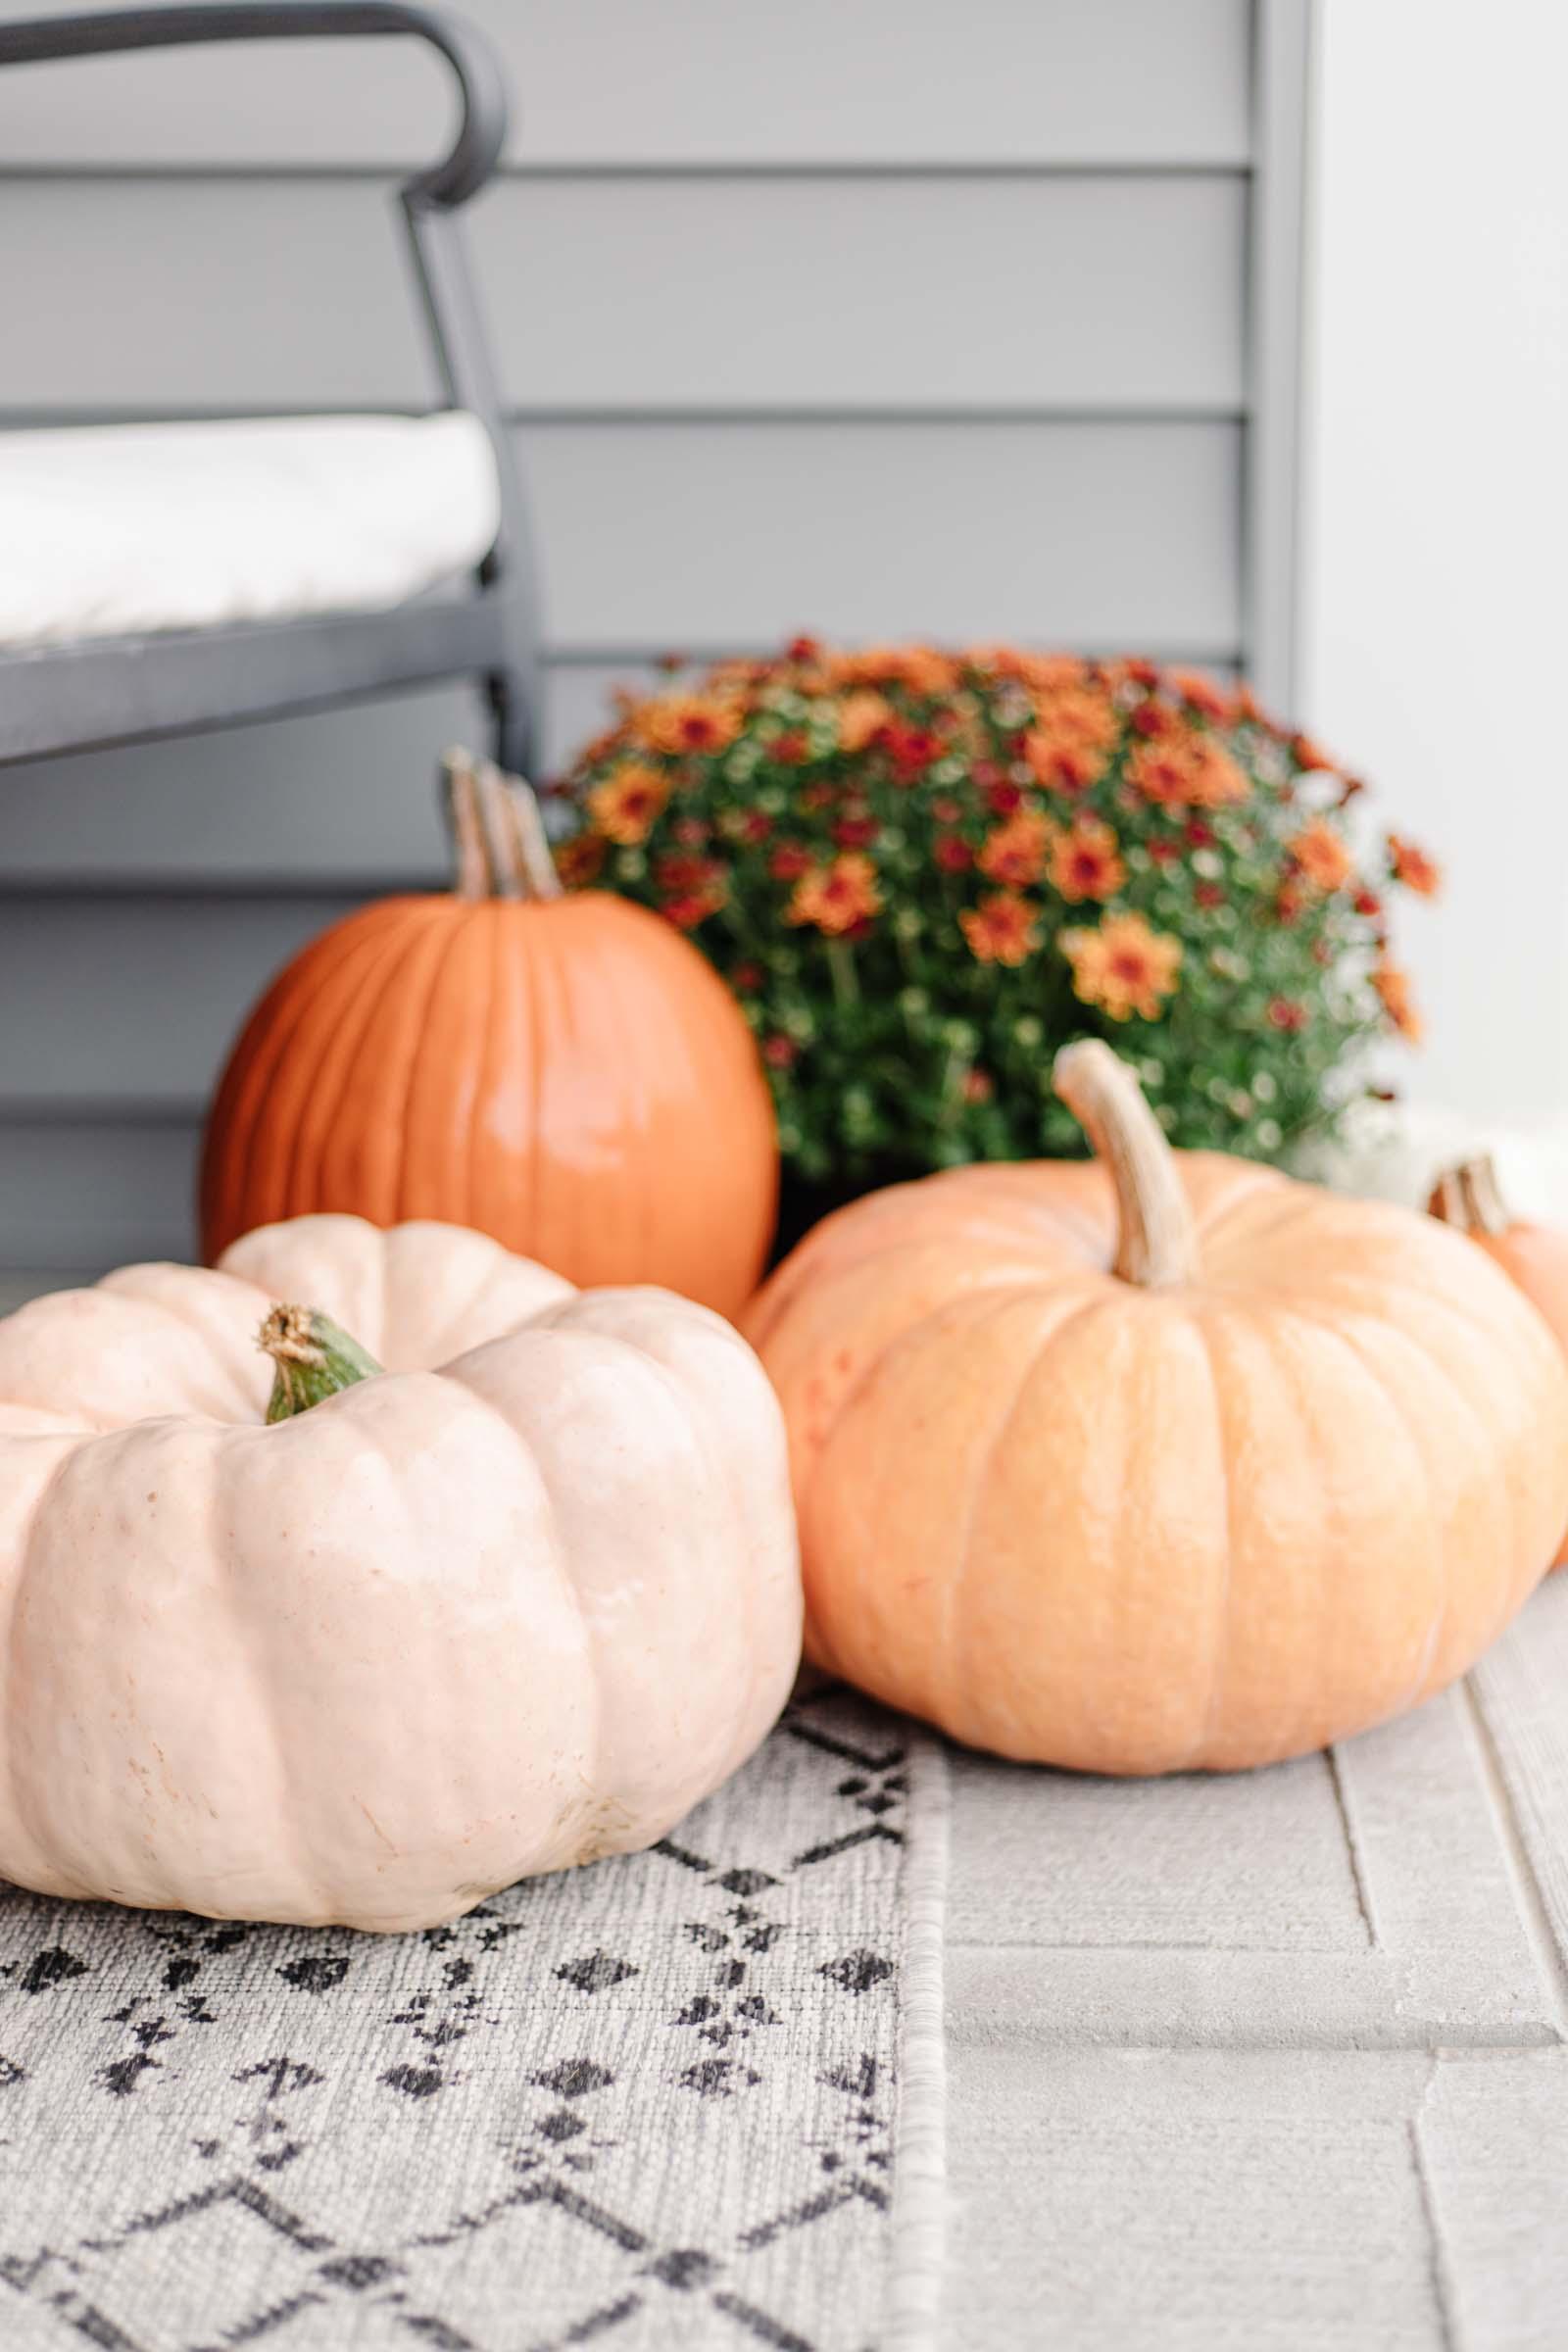 assorted orange and pink pumpkins